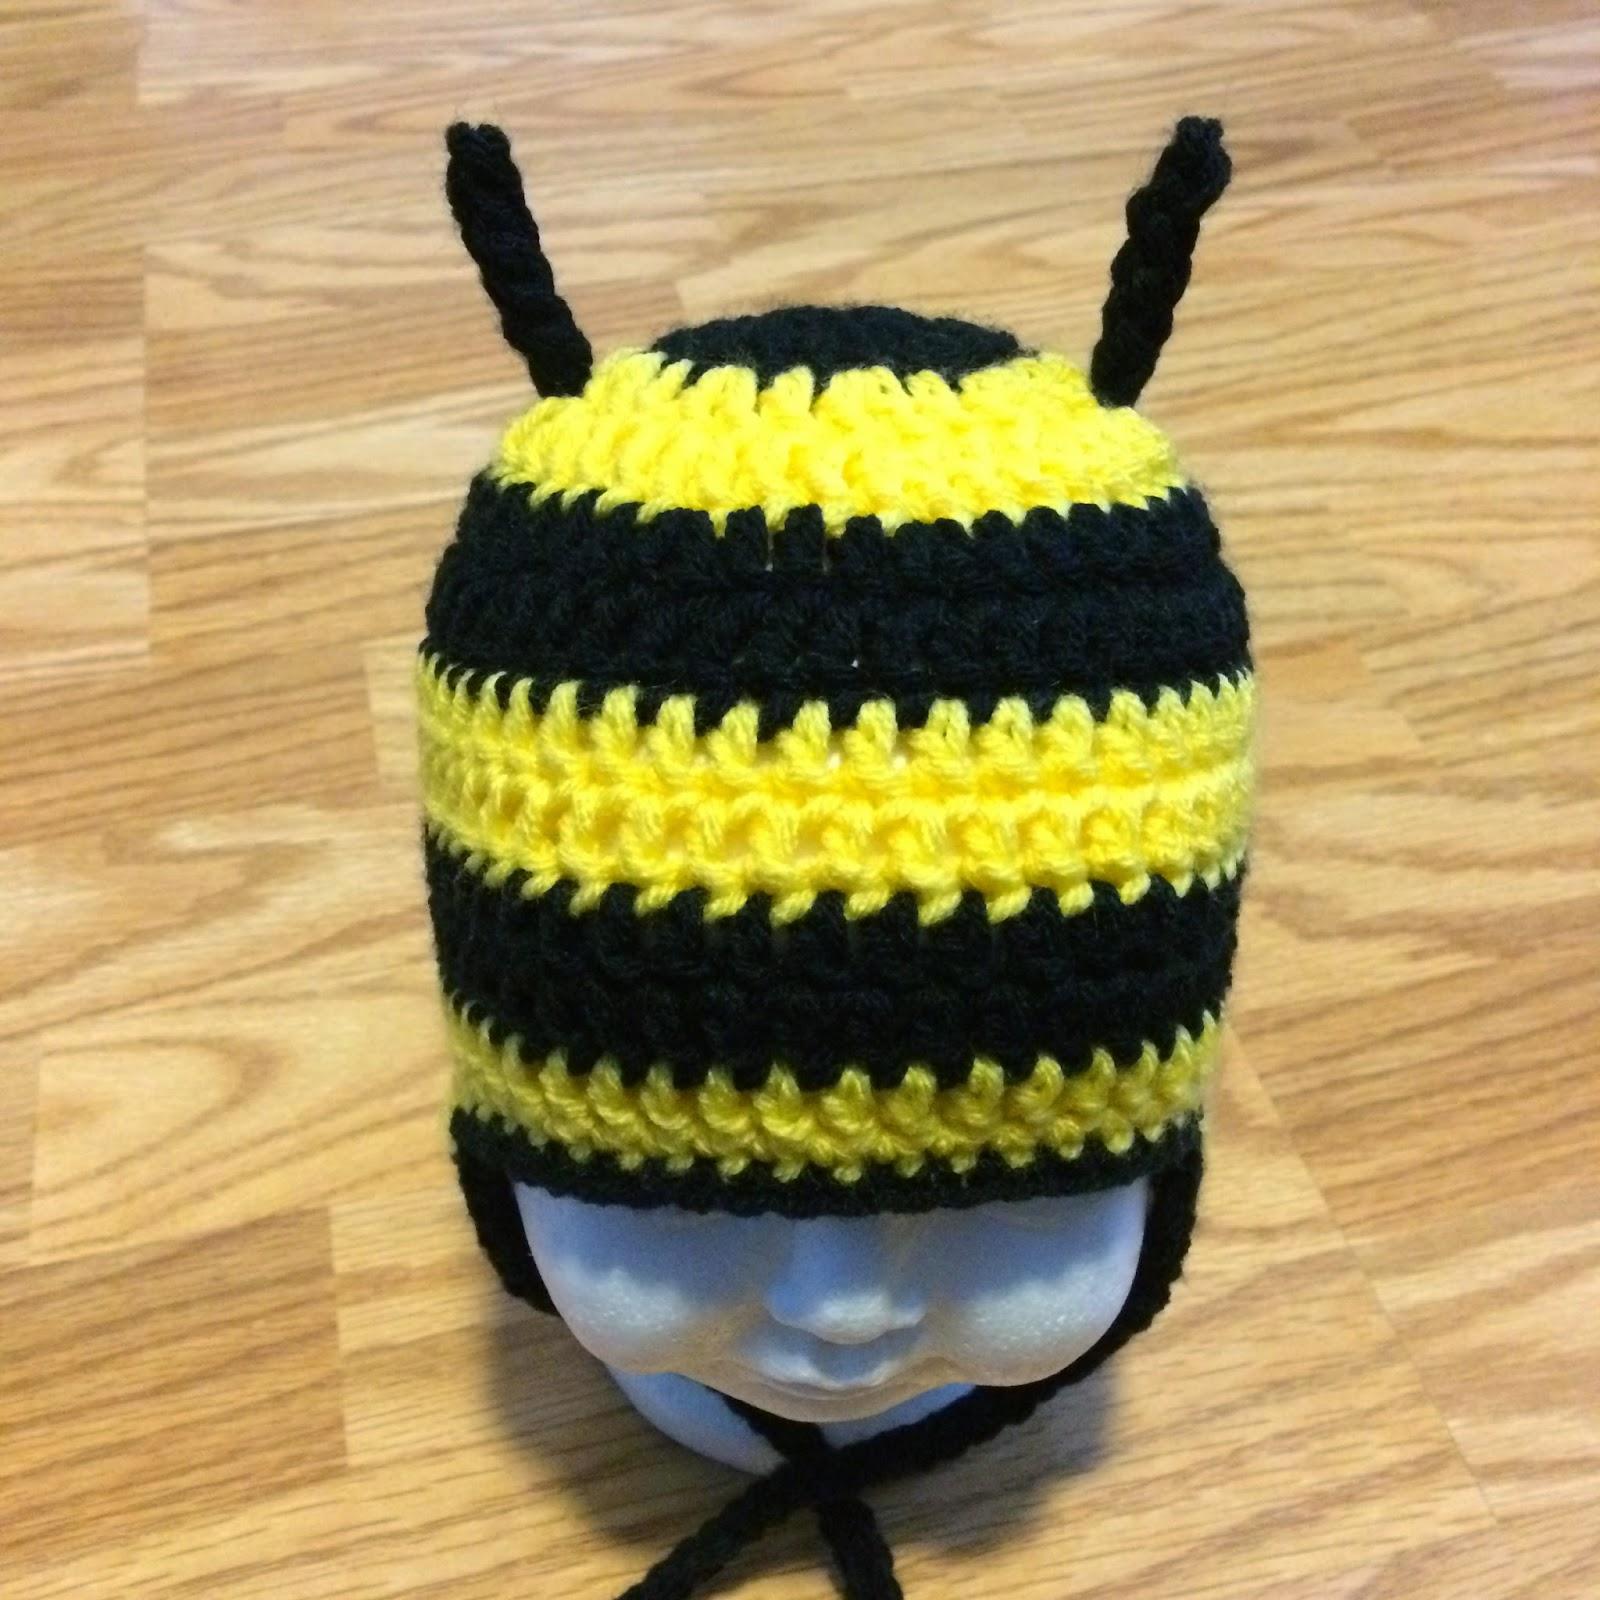 36 Cool Amigurumi Projects To Crochet   Free Patterns   1600x1600